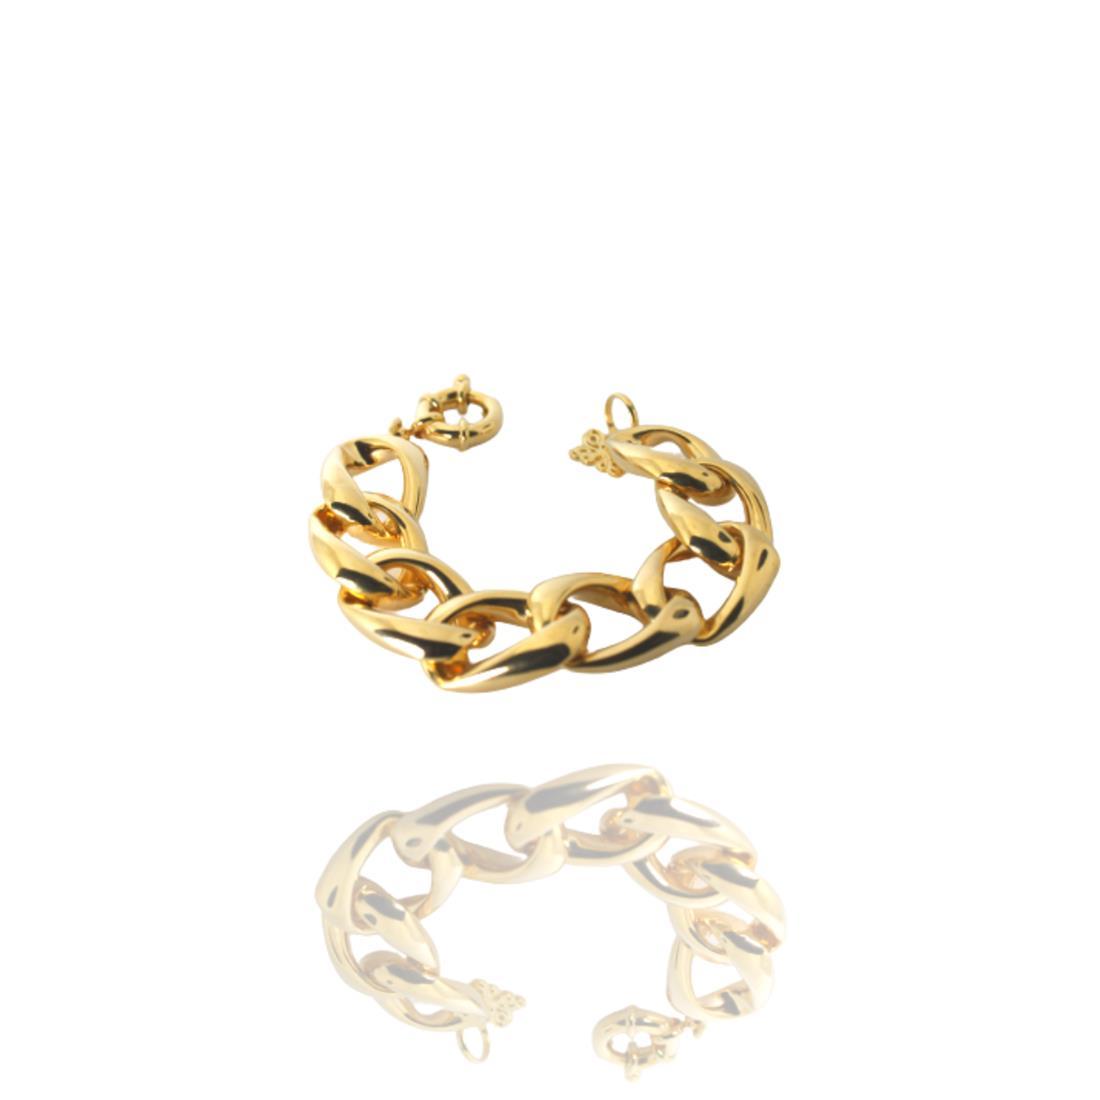 Pulseira Dourada Bósnia Metal  Banhado Ouro Barbara Strauss